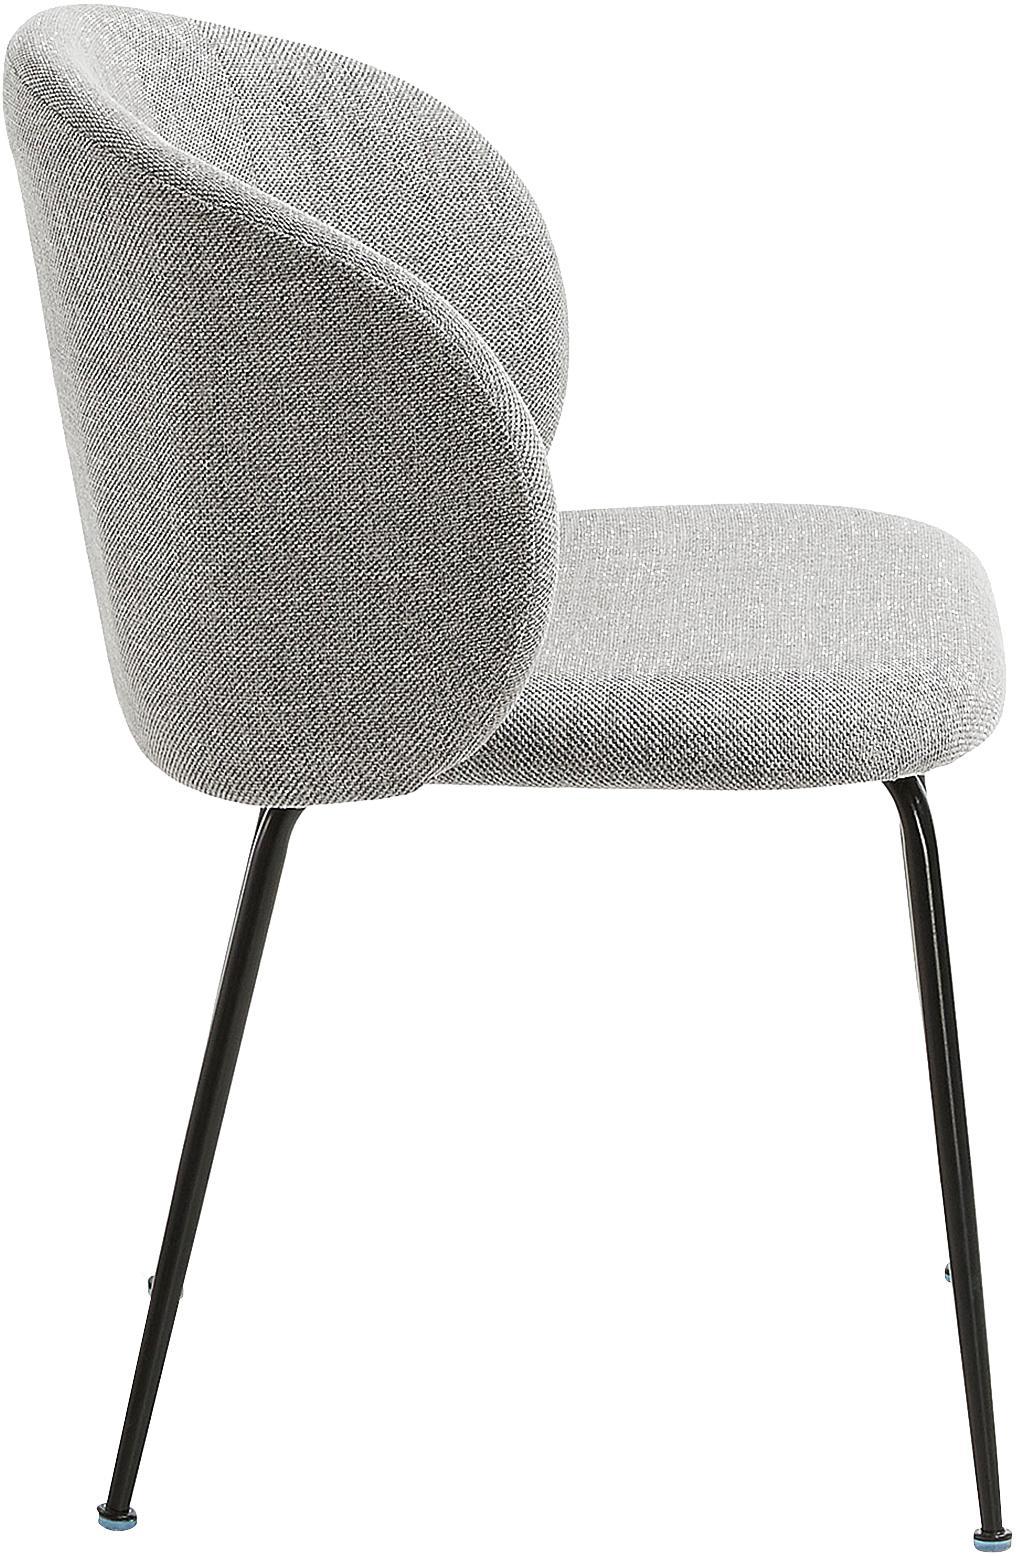 Polsterstühle Minna, 2 Stück, Sitzfläche: Textil, Gestell: Metall, lackiert, Hellgrau, Schwarz, B 57 x T 56 cm